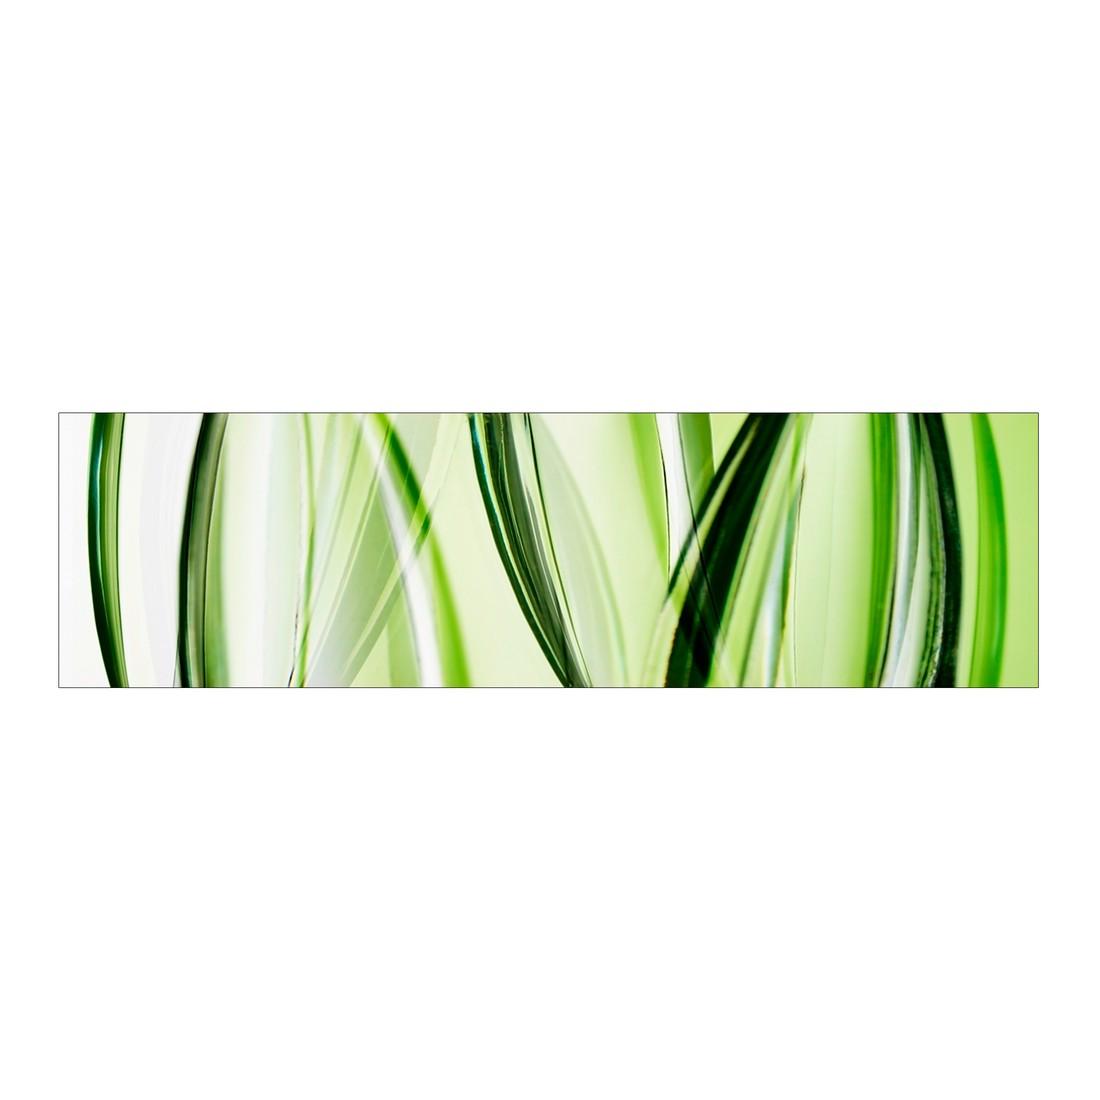 Leinwandbild Grassy Green – 120×30 cm, Gallery of Innovative Art jetzt bestellen